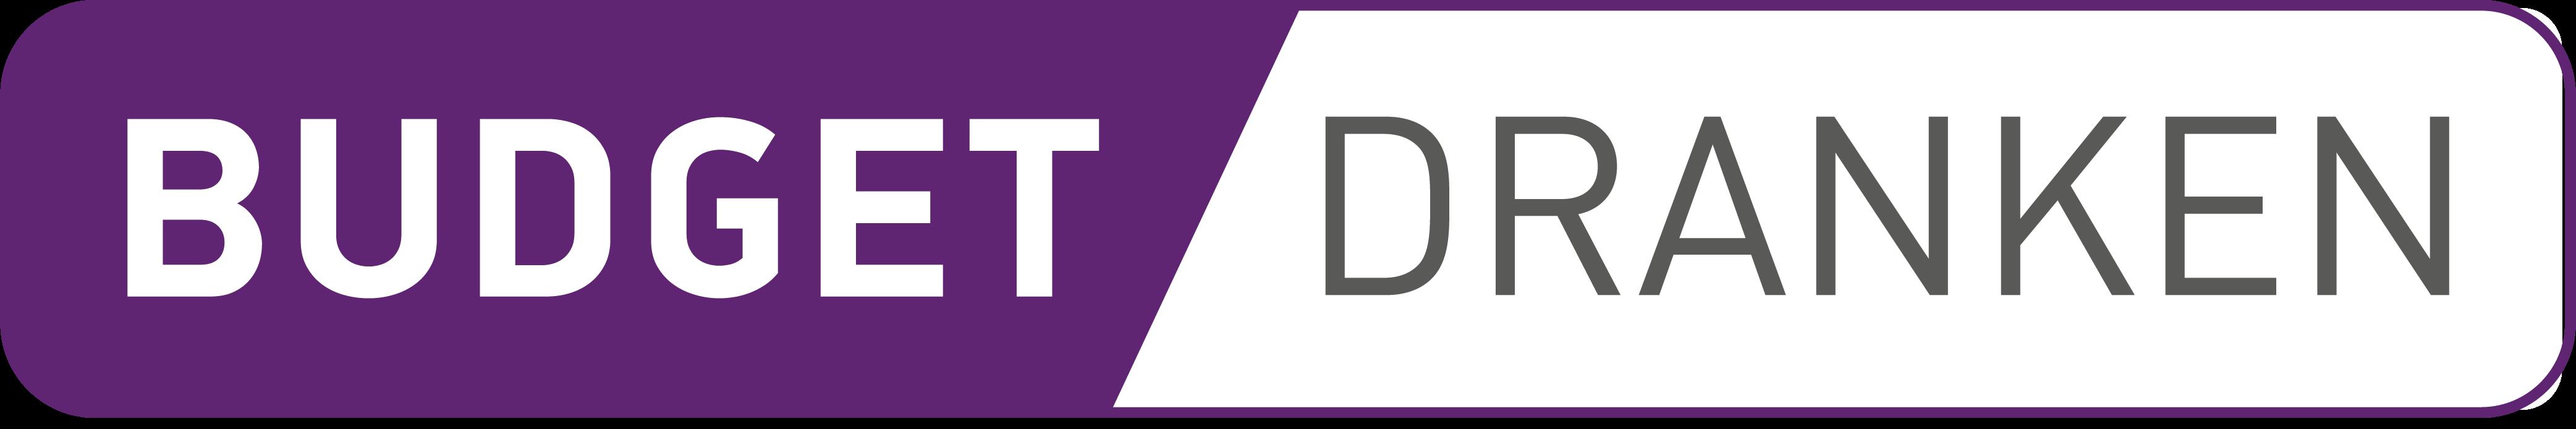 Drankoutlet.nl